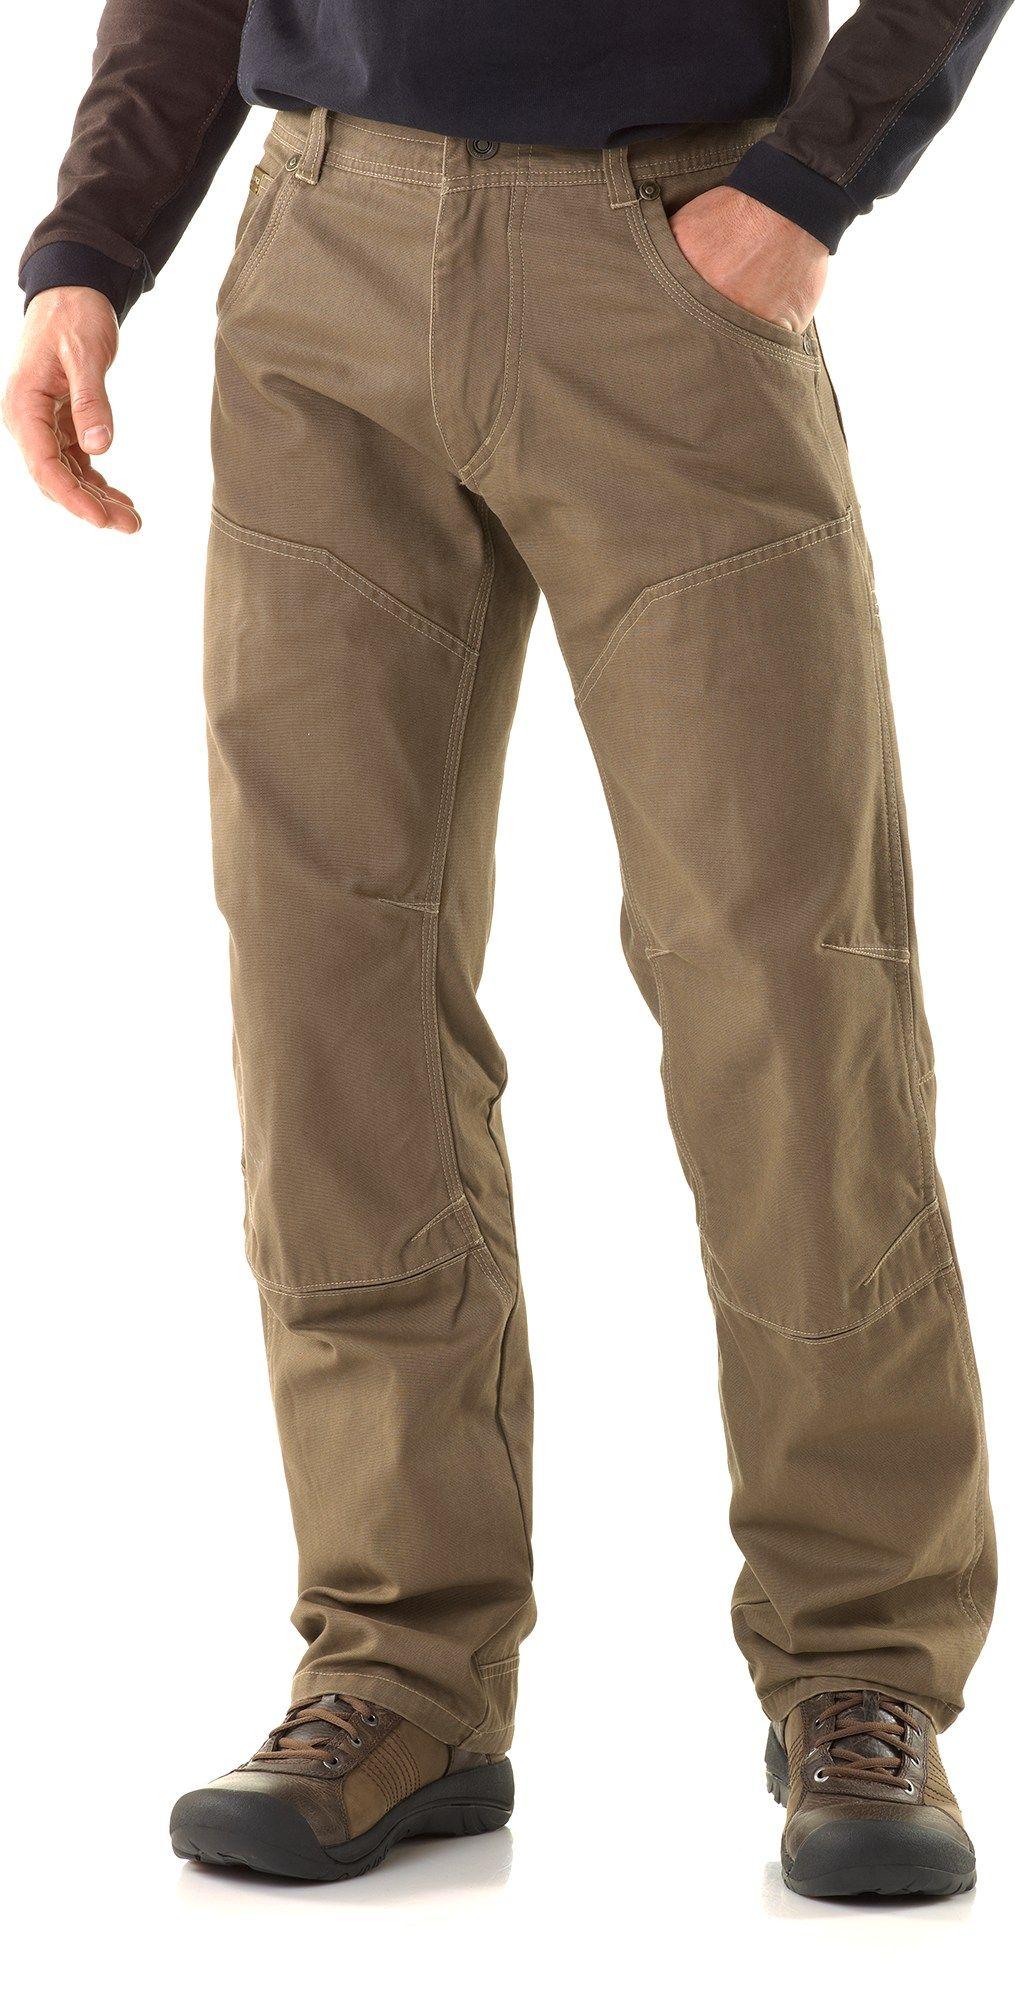 5ef95b475899e2 The Law Pants - Men's 32